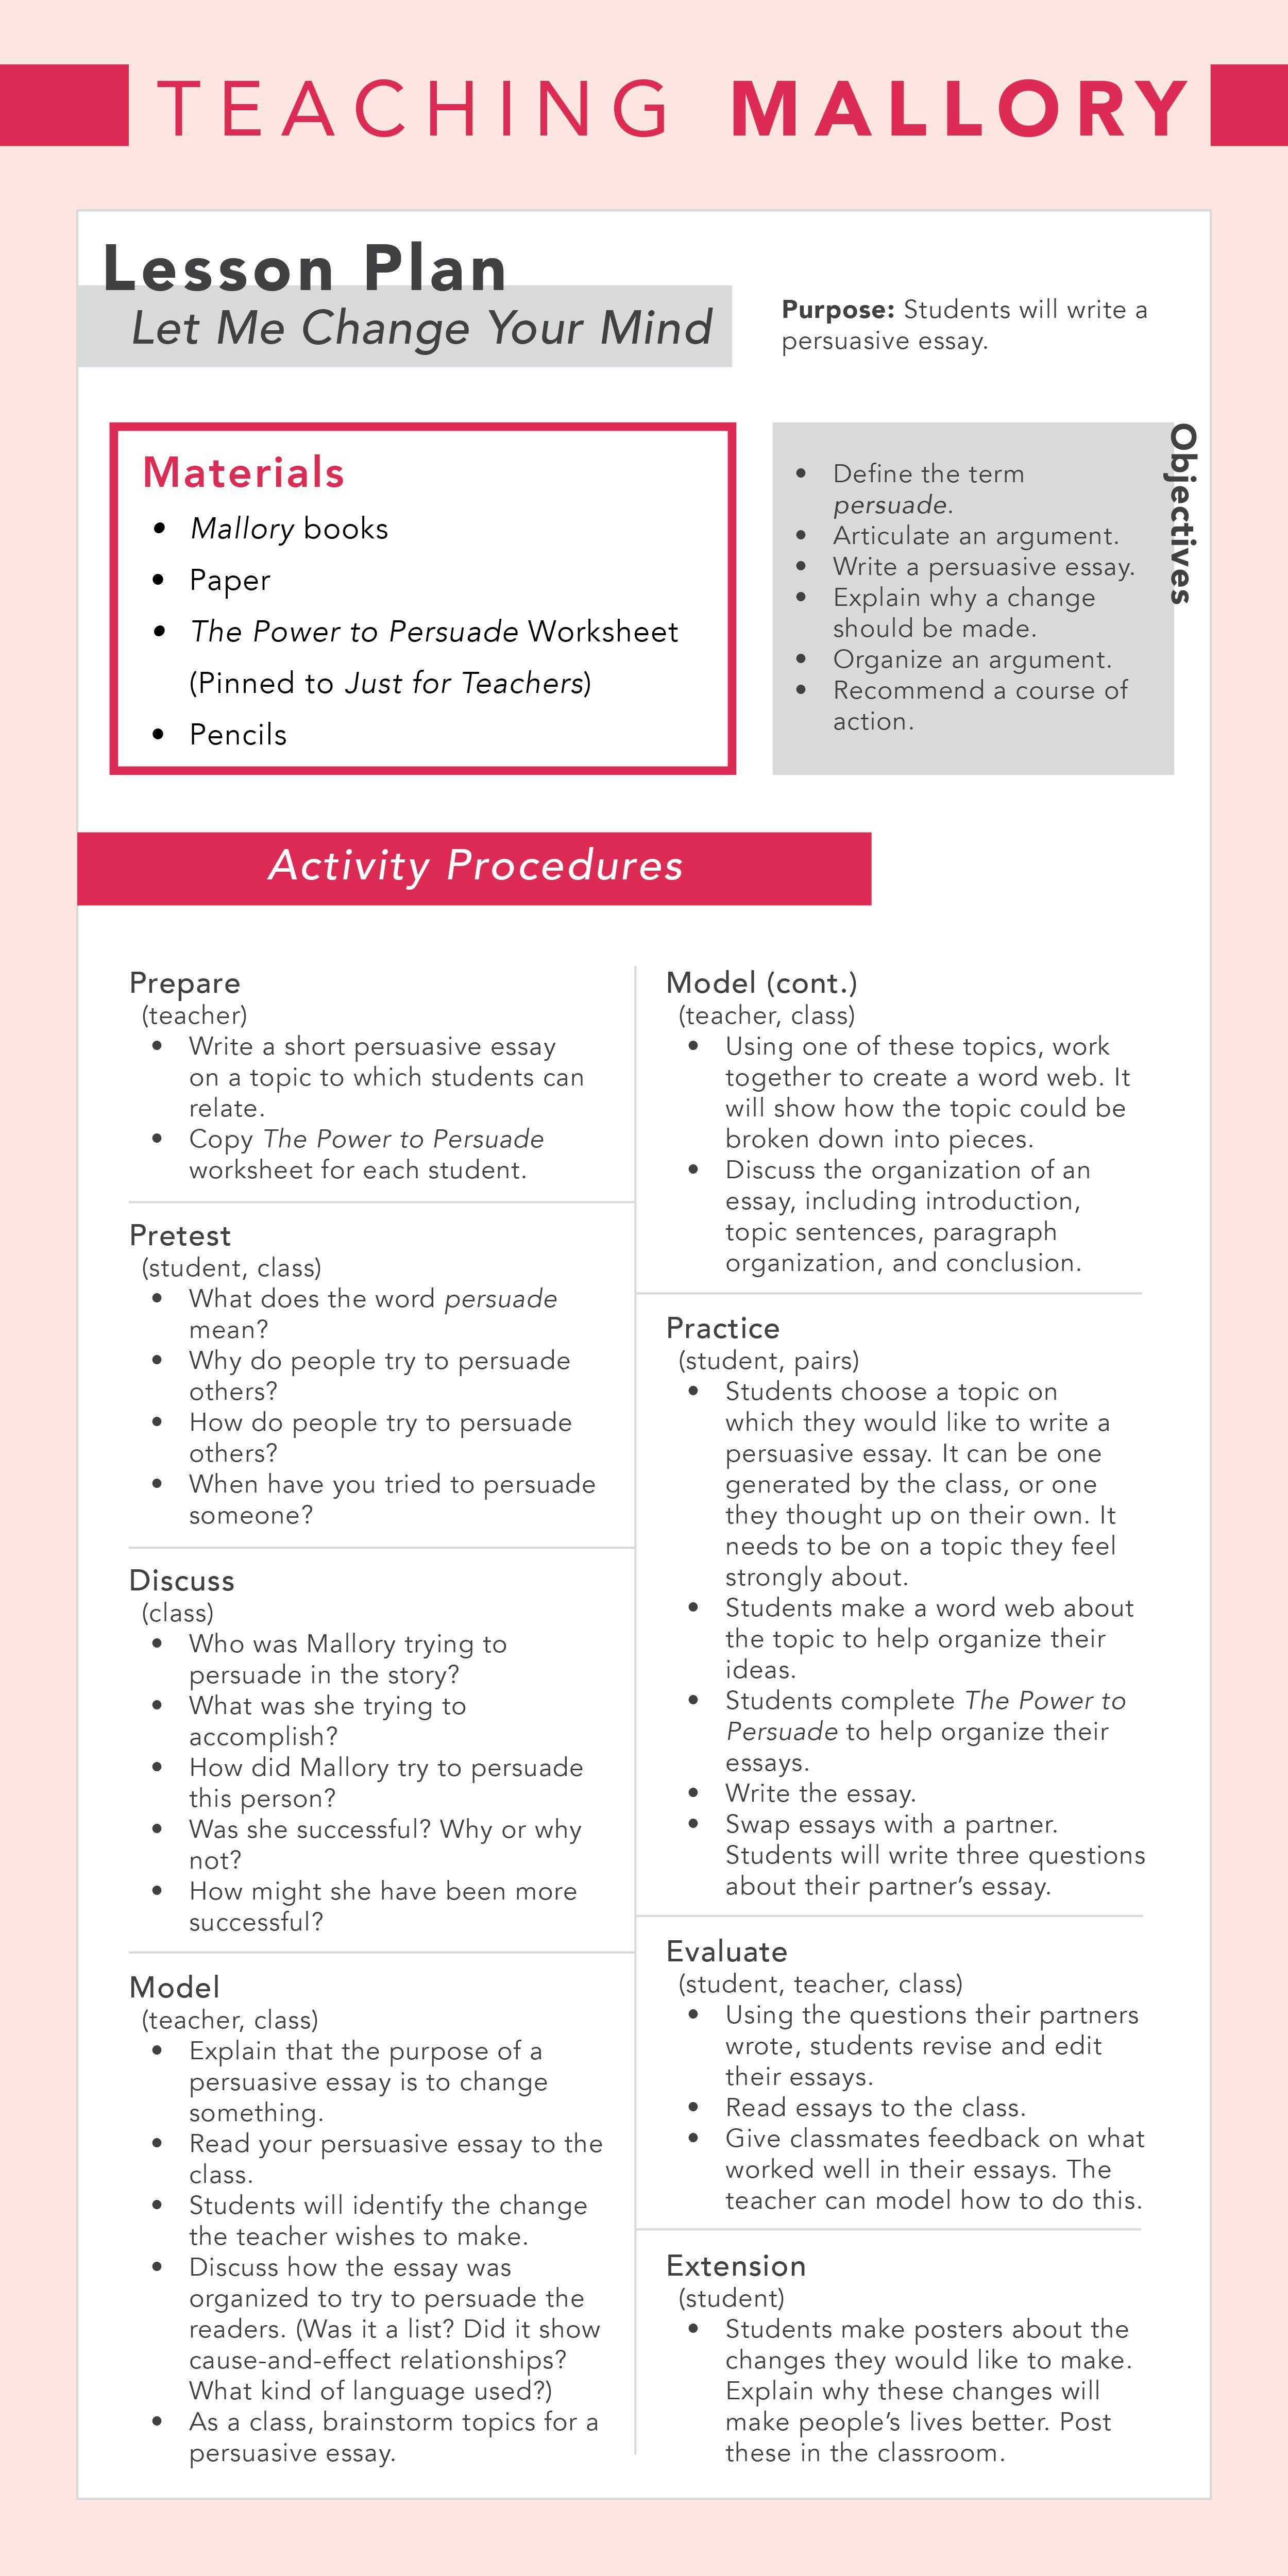 Teachingmallory 3rd Grade Teacher Lessonplan Note Don